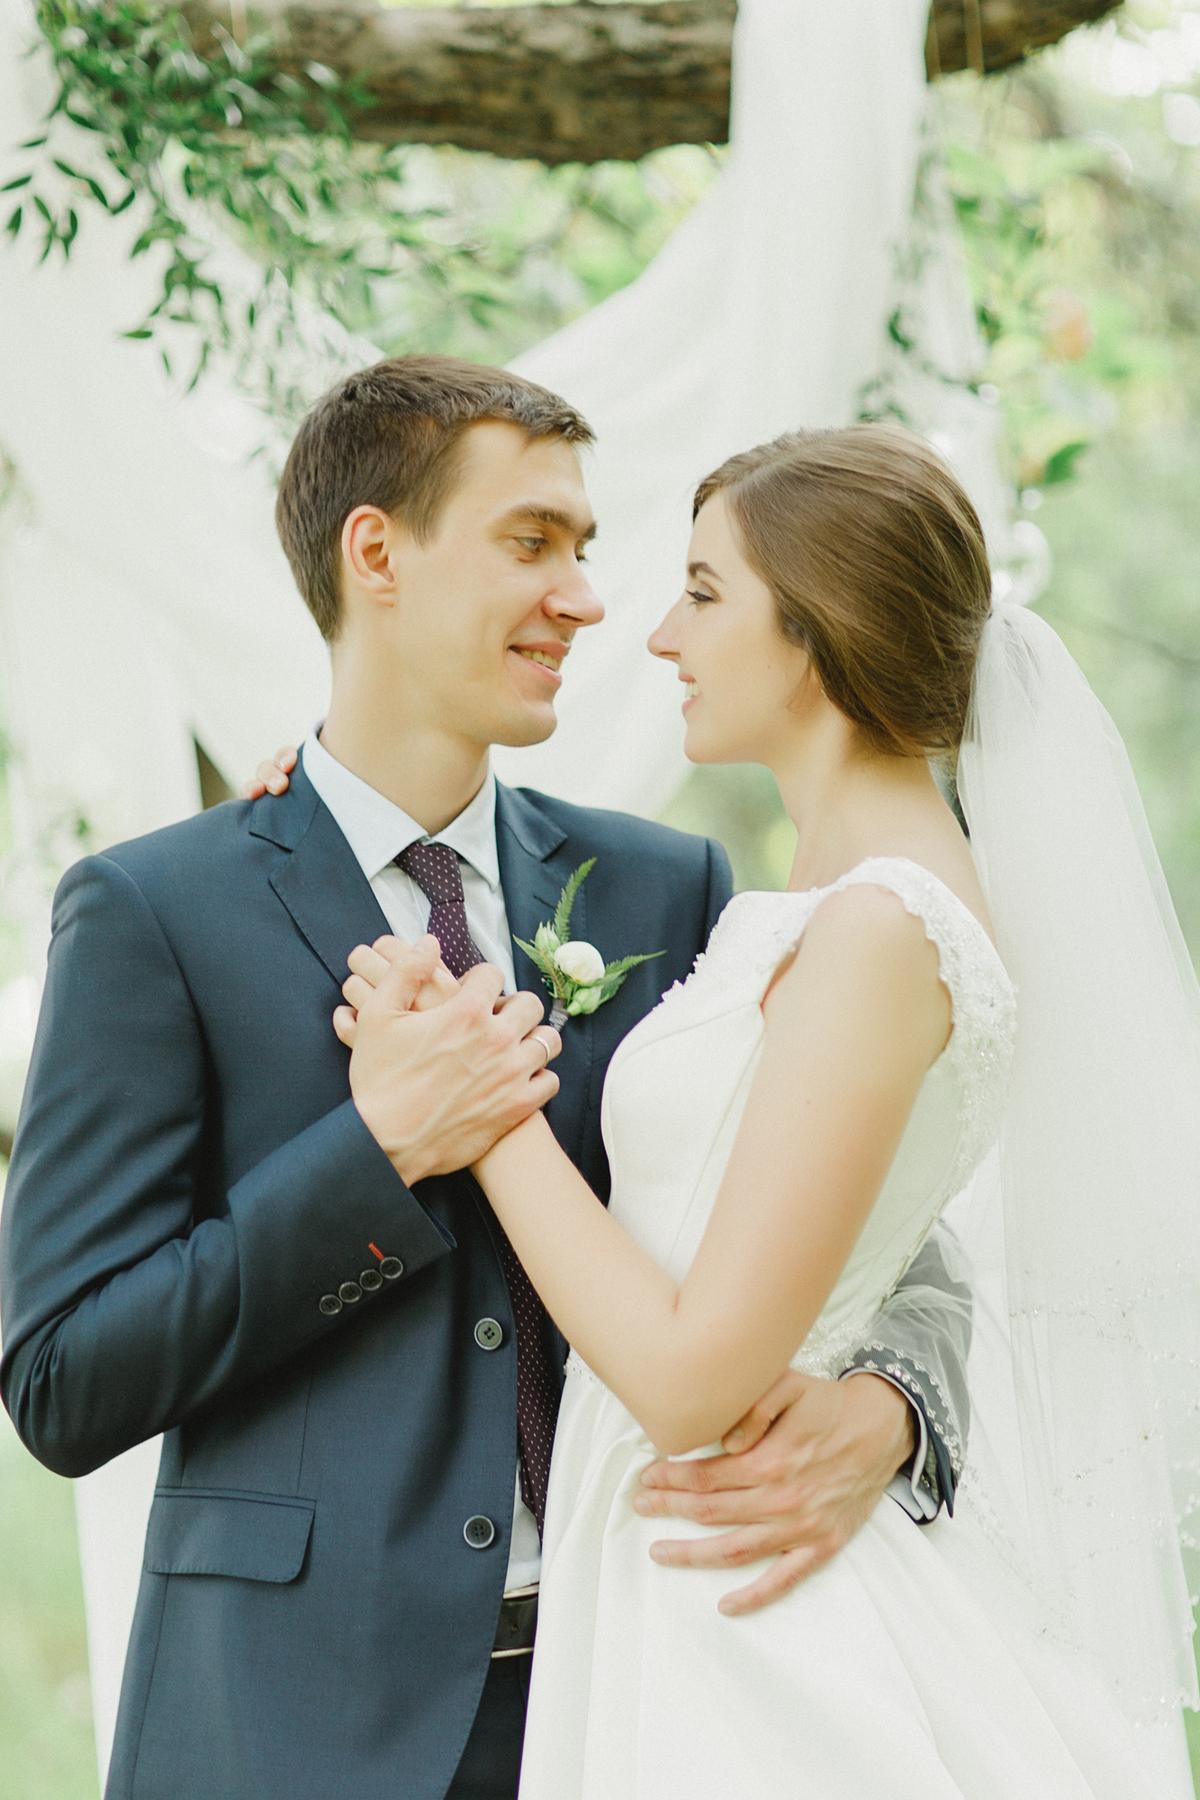 Vladimir and Elizabeth